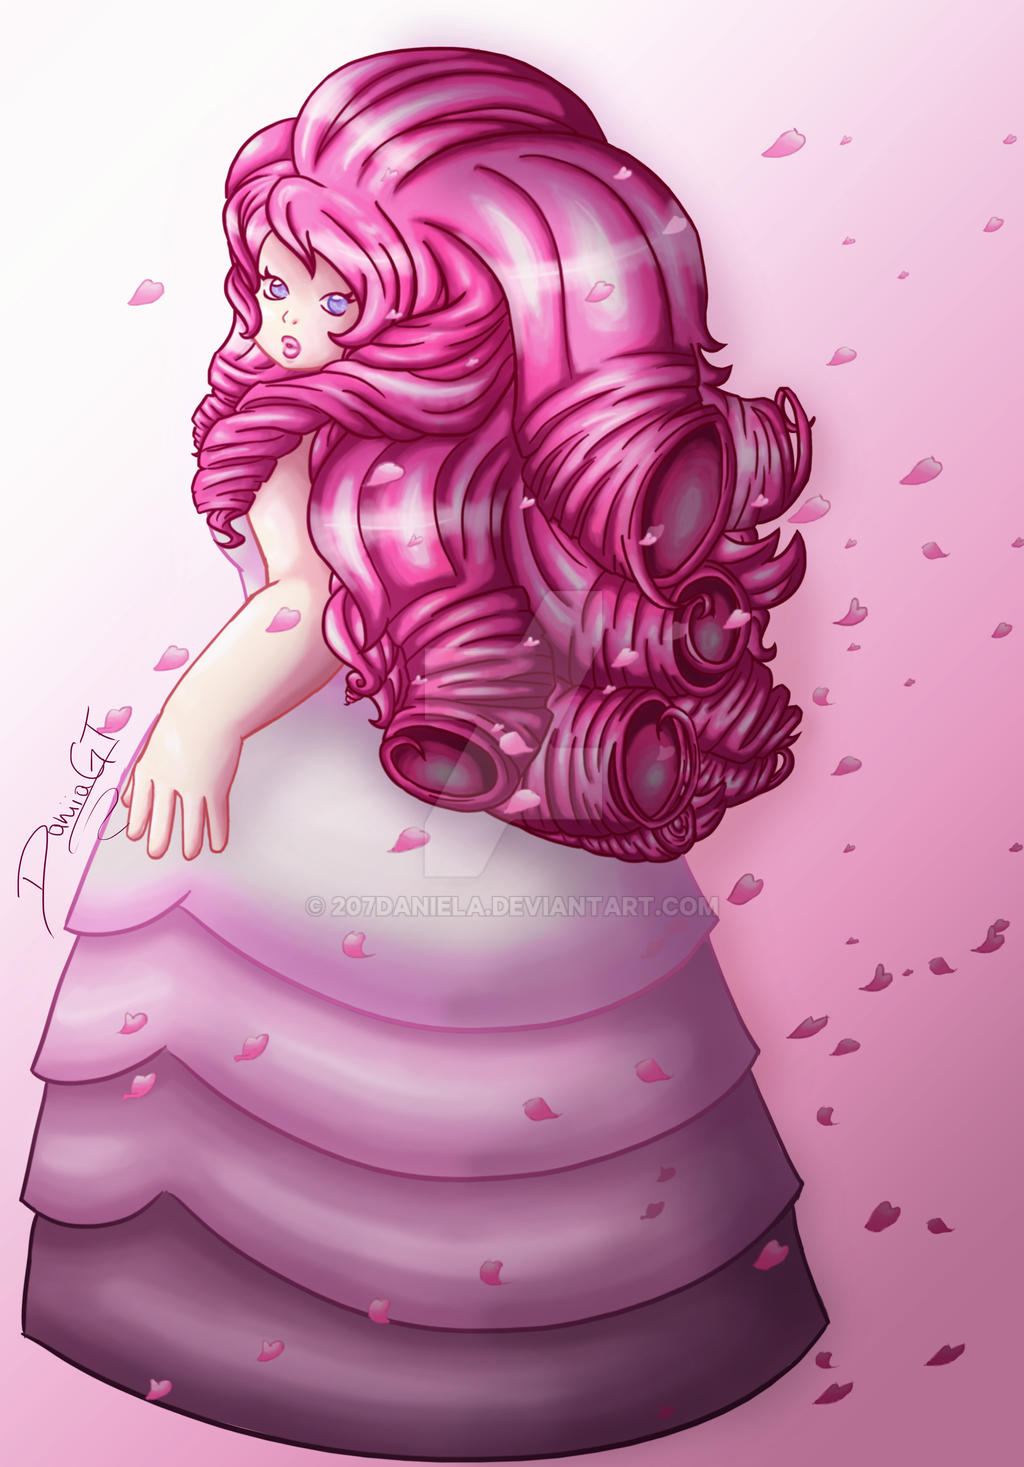 Rose quartz steven universe by 207daniela on deviantart - Rose quartz steven universe wallpaper ...